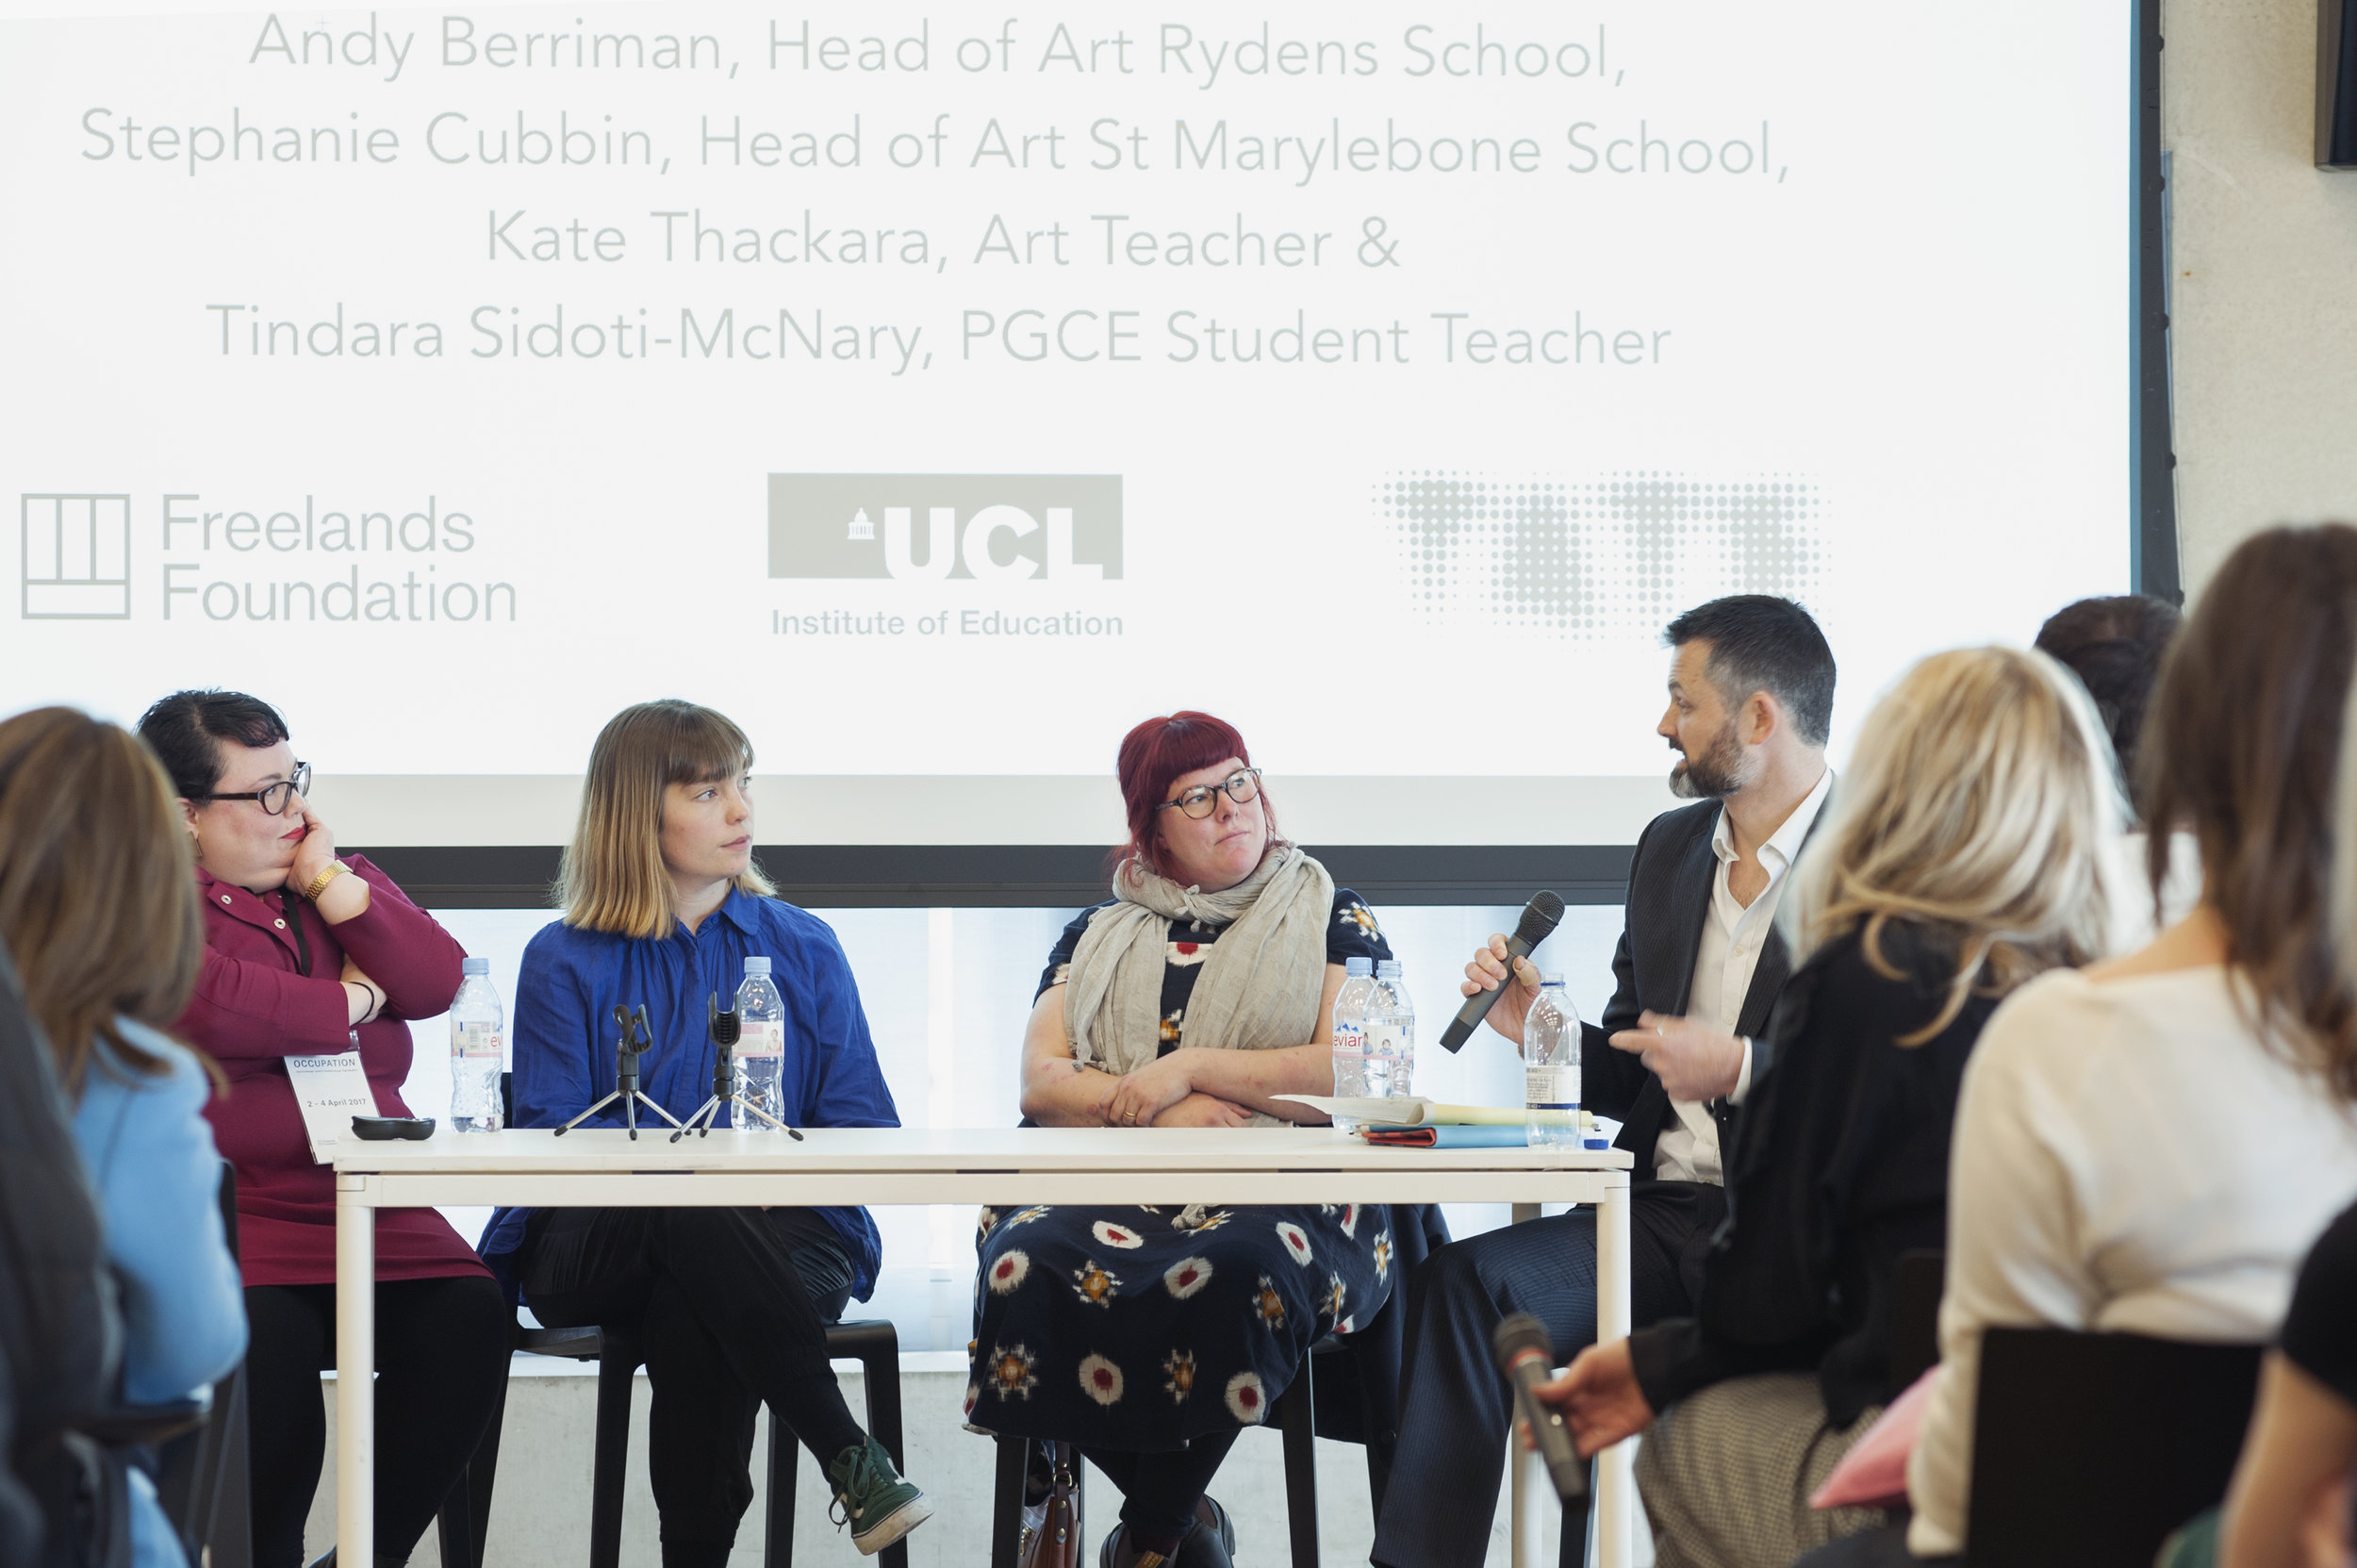 OCCUPATION Panel - Why Be An Art Teacher.jpg